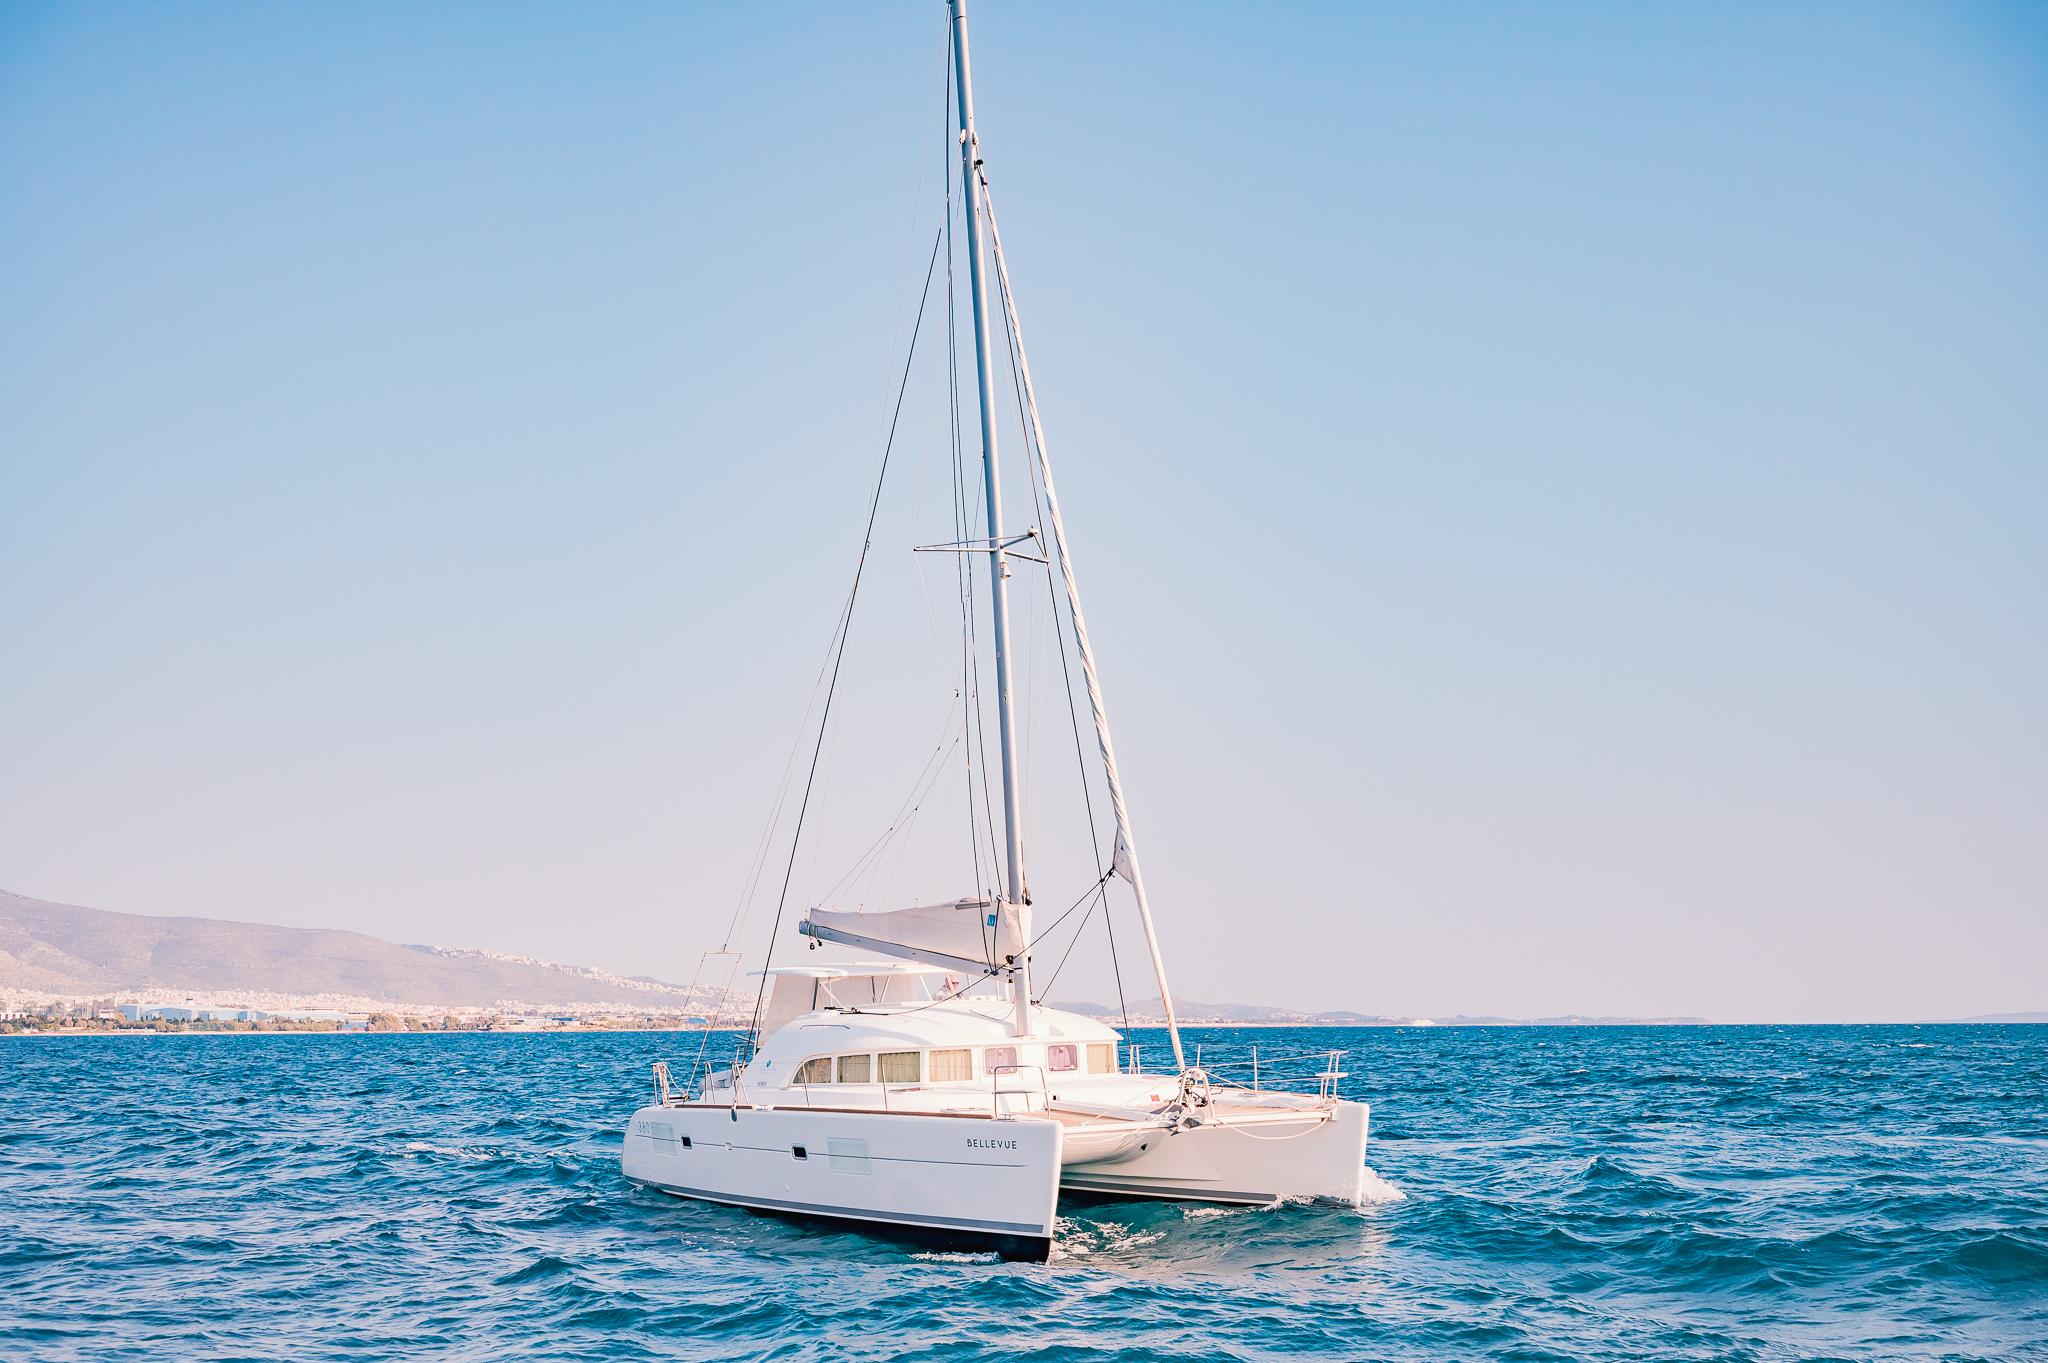 Lagoon 380s, Bellevue - Catamaran Charteting in Greece - Exterior (1)